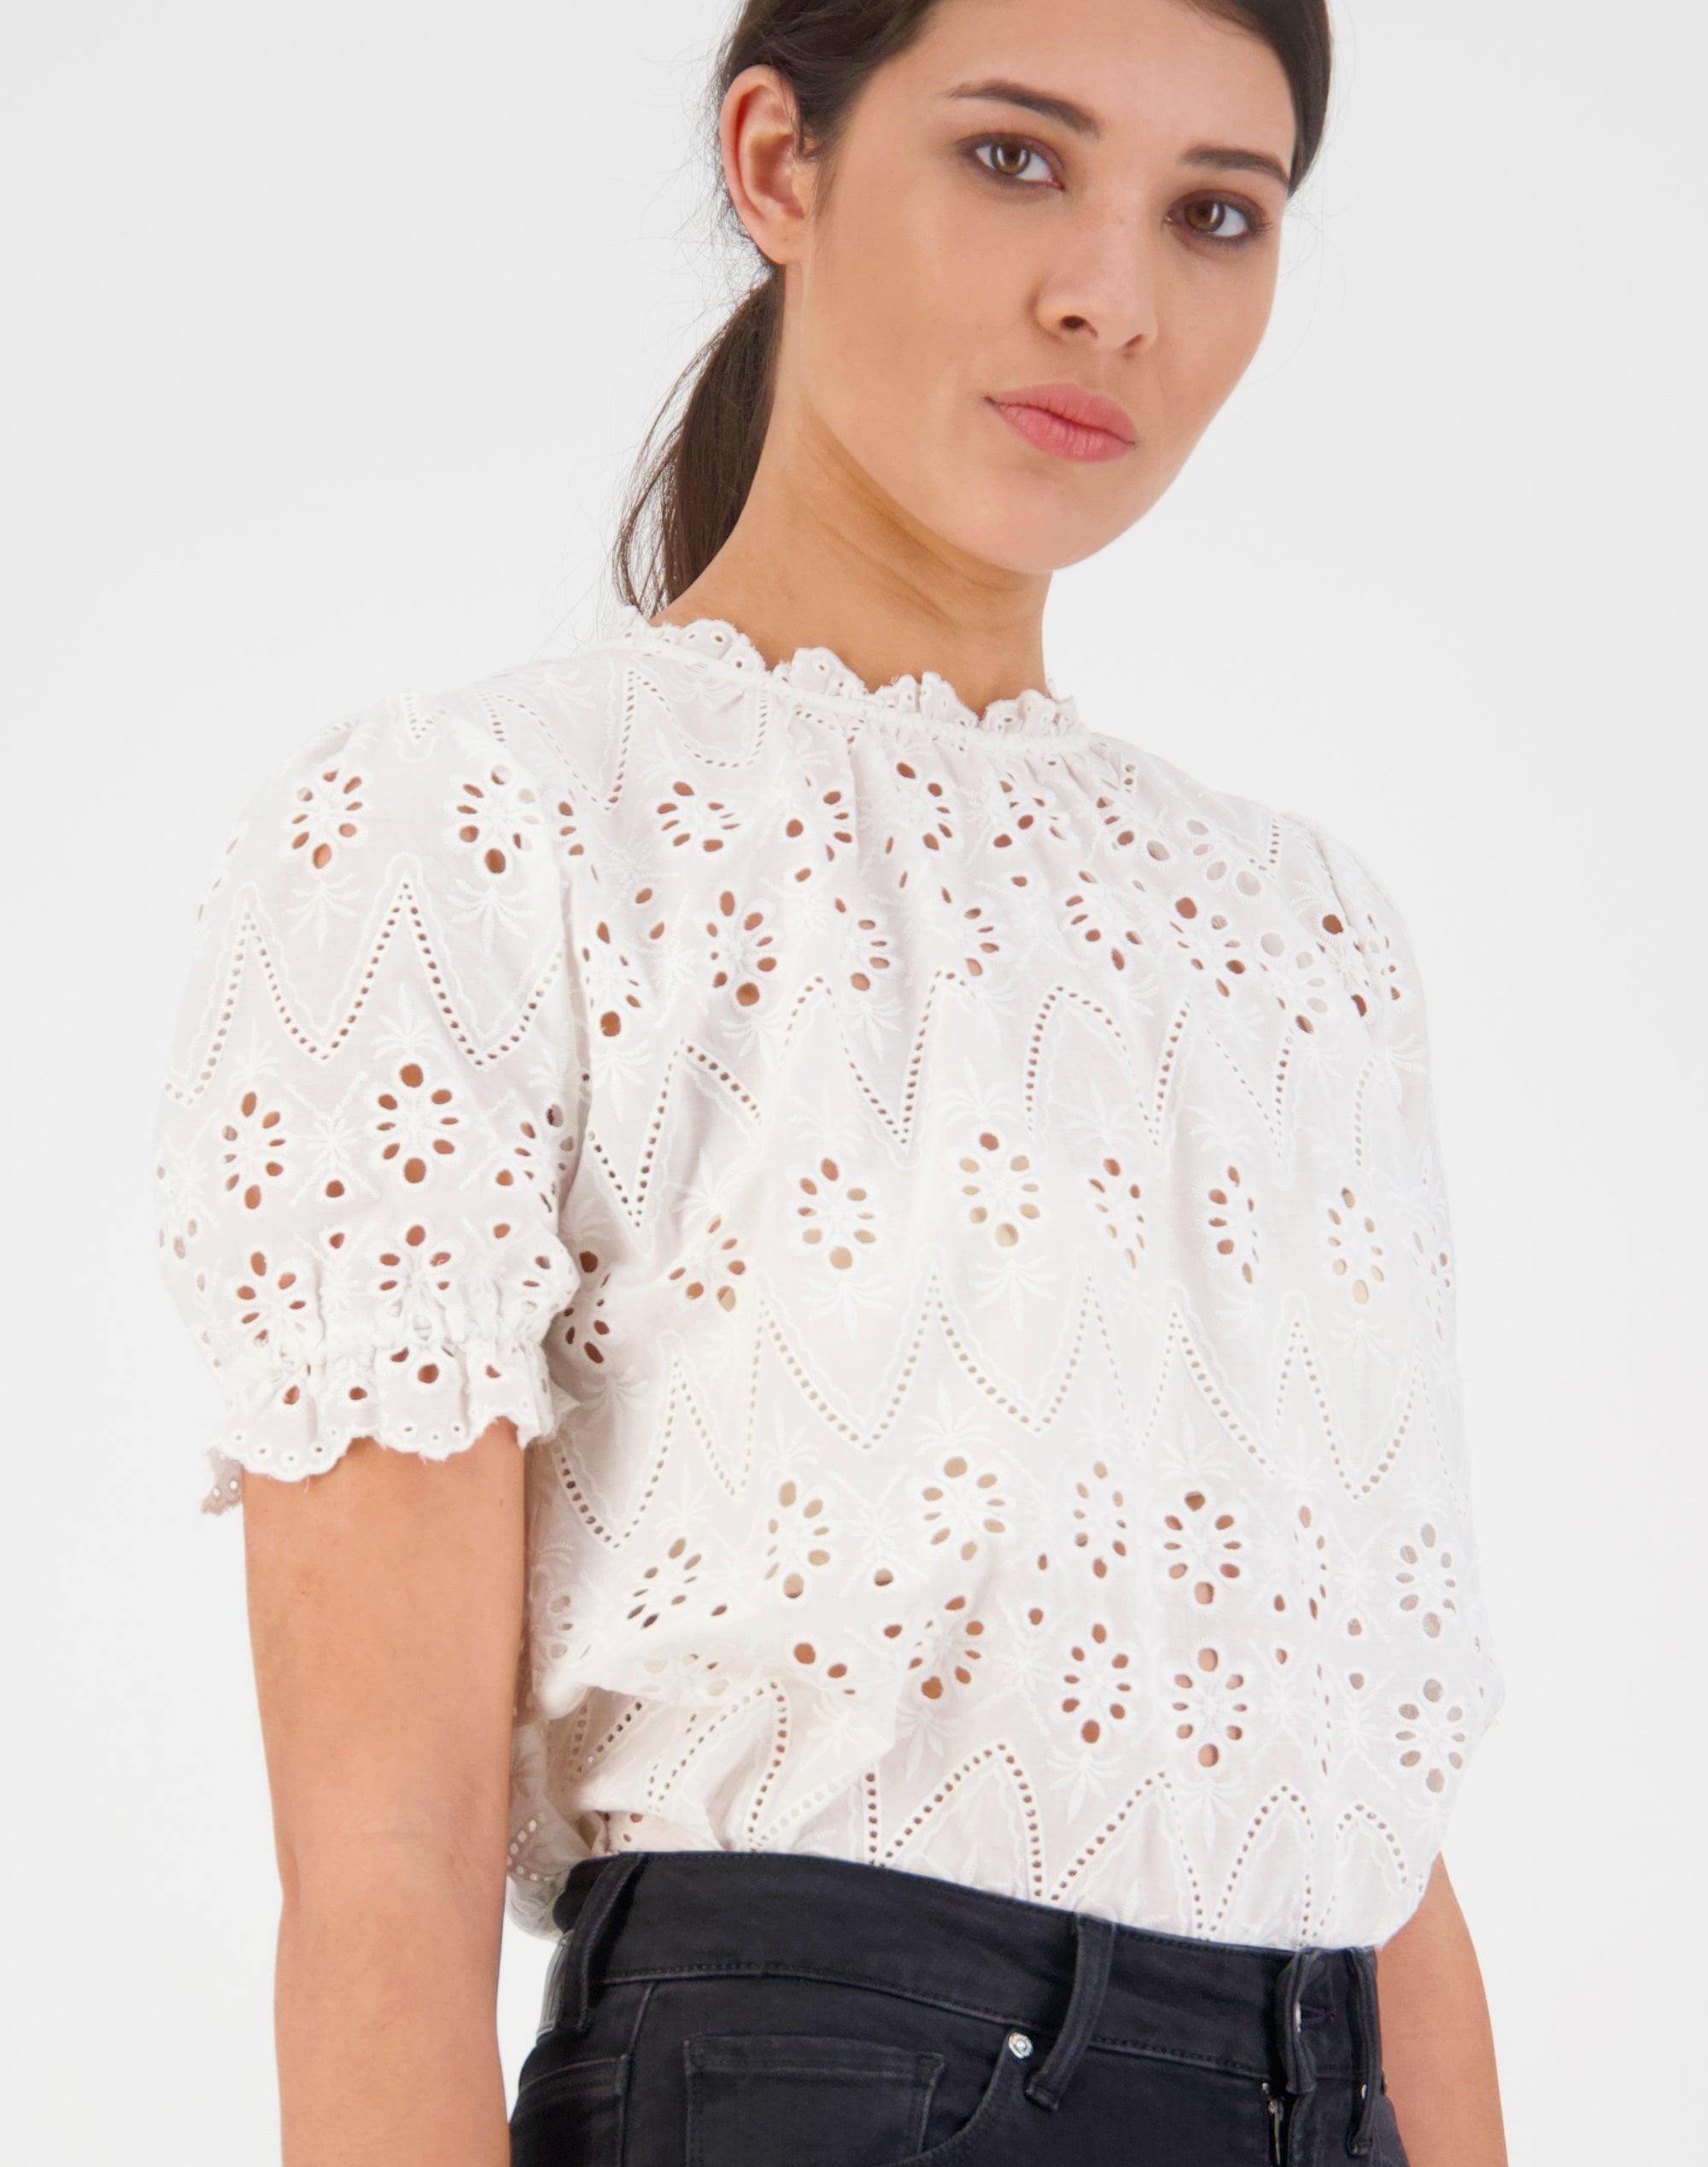 Arch Cotton Top